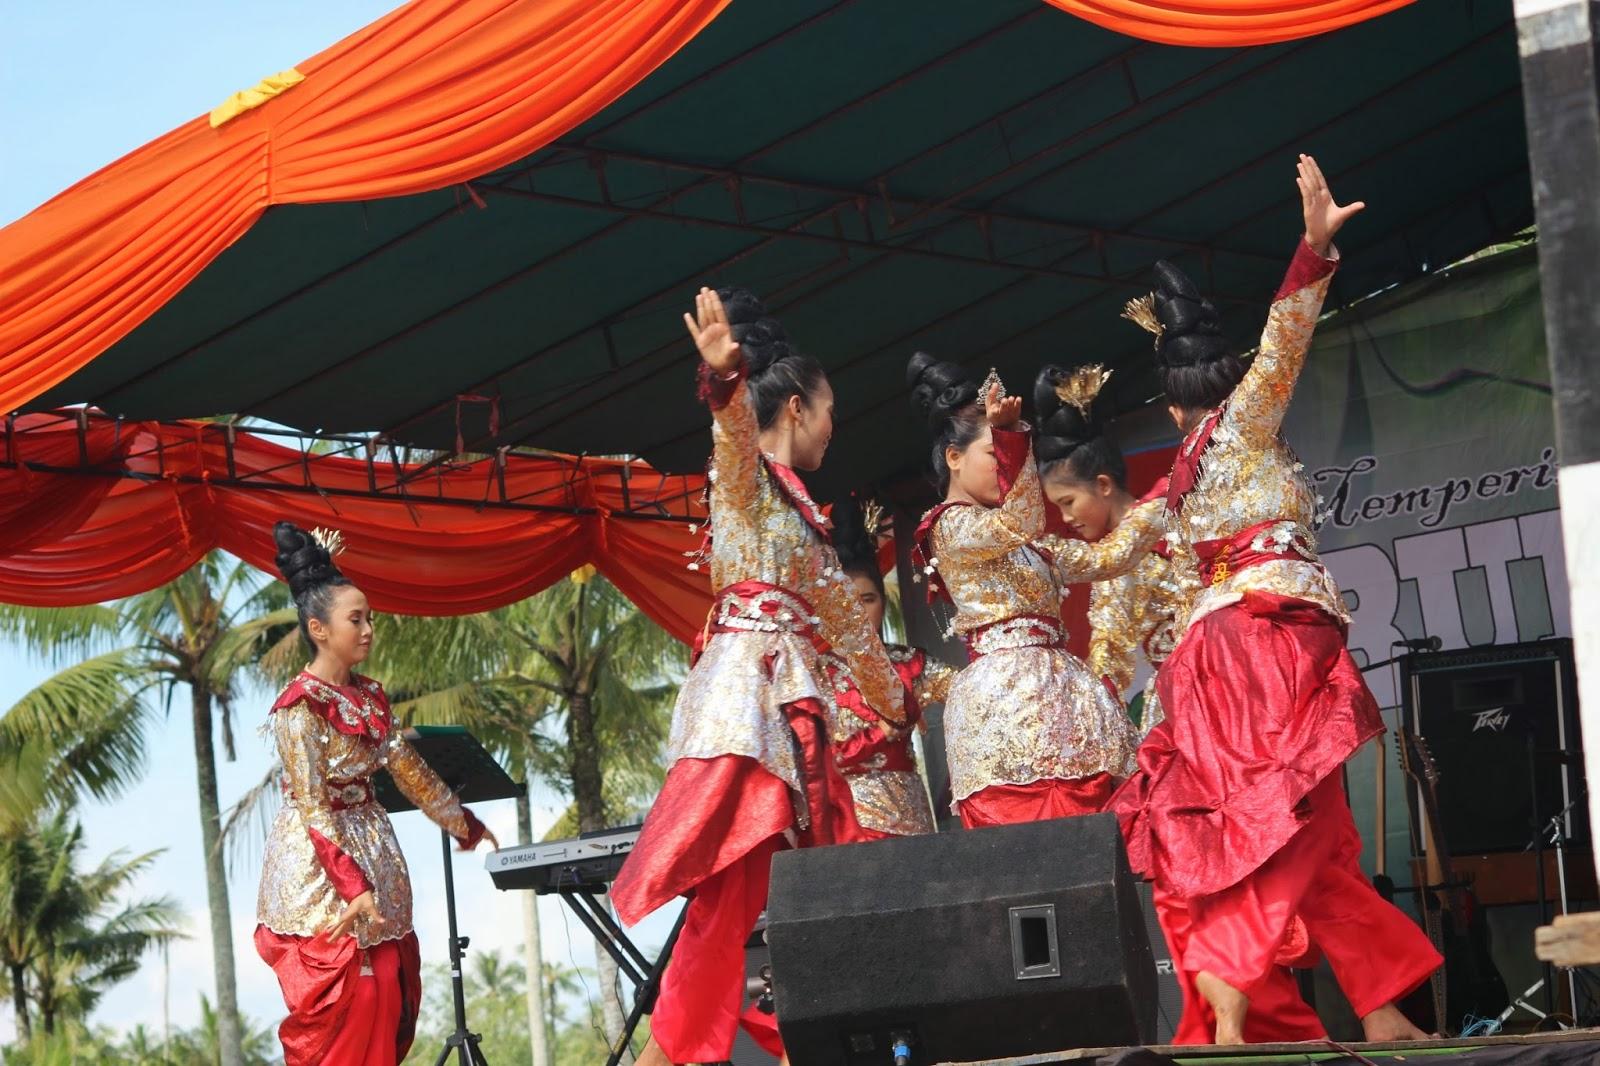 Foto Pensi Sman 10 Singkawang 2013 Part 4 Nilai Education Ii